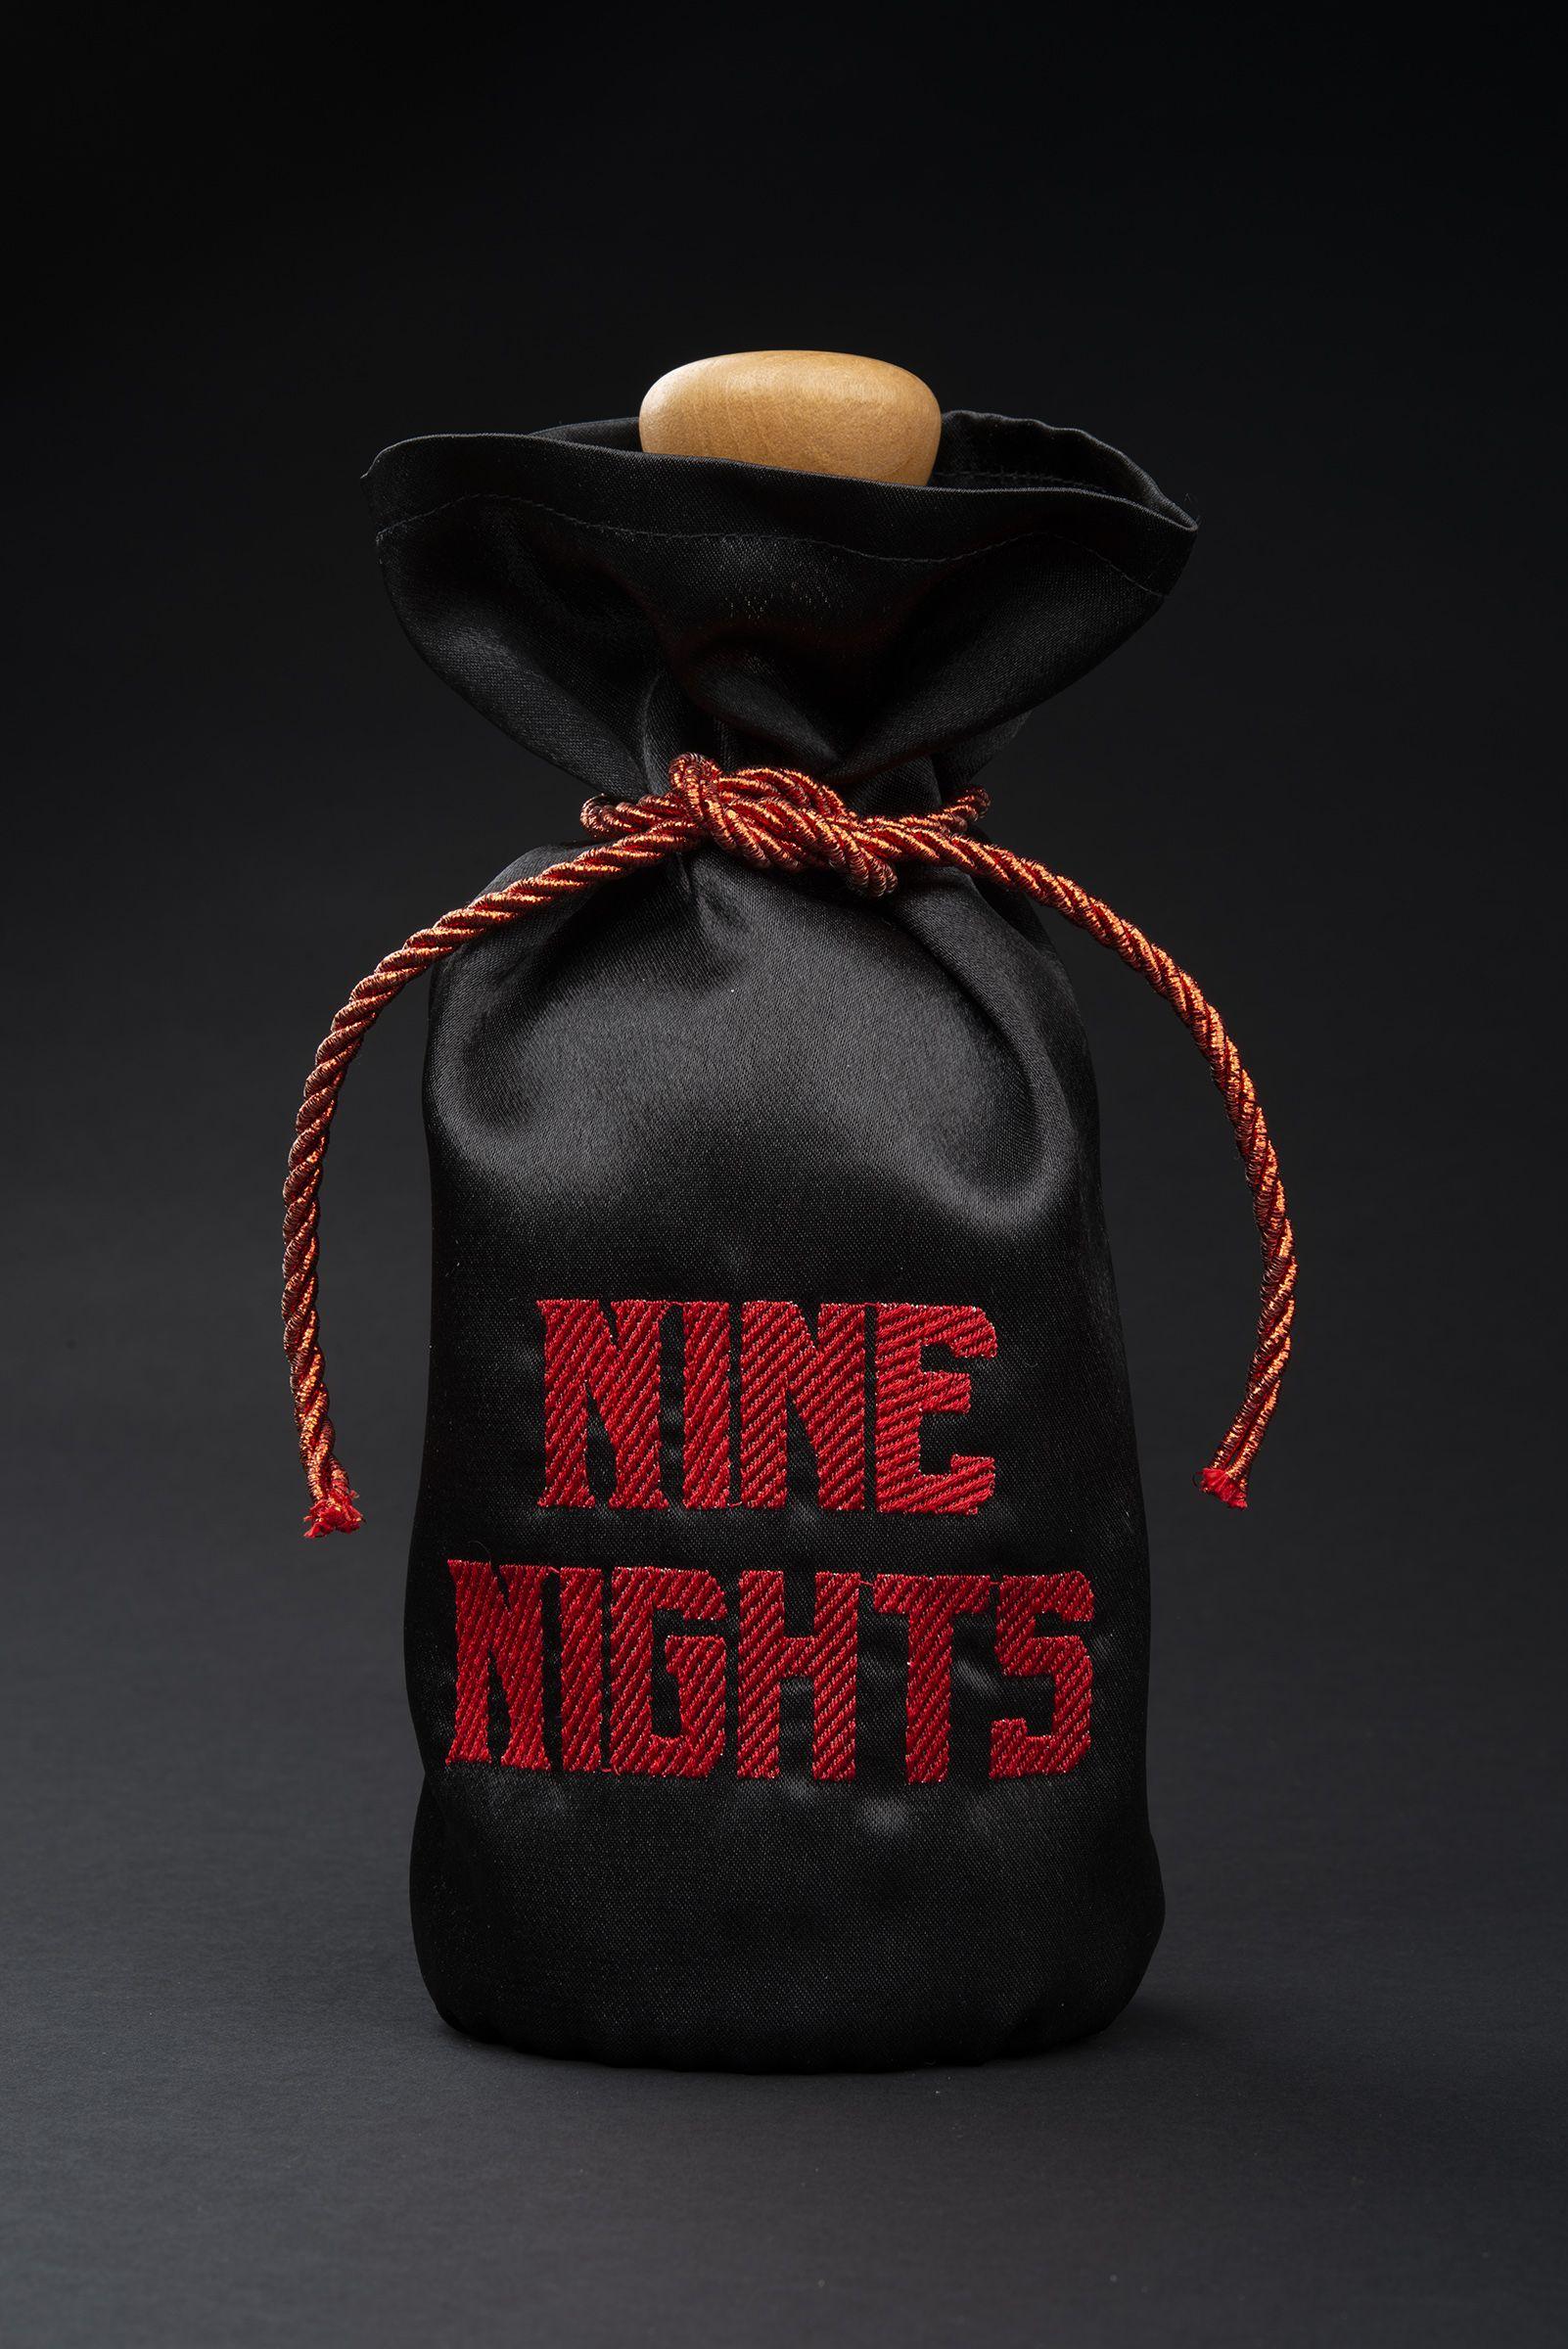 Mackenzie Standaert Nine Nights World Brand Design Society Nine Nights Is A Bilingual Rum Bottle That Show Rum Bottle Bottle Packaging Packaging Design